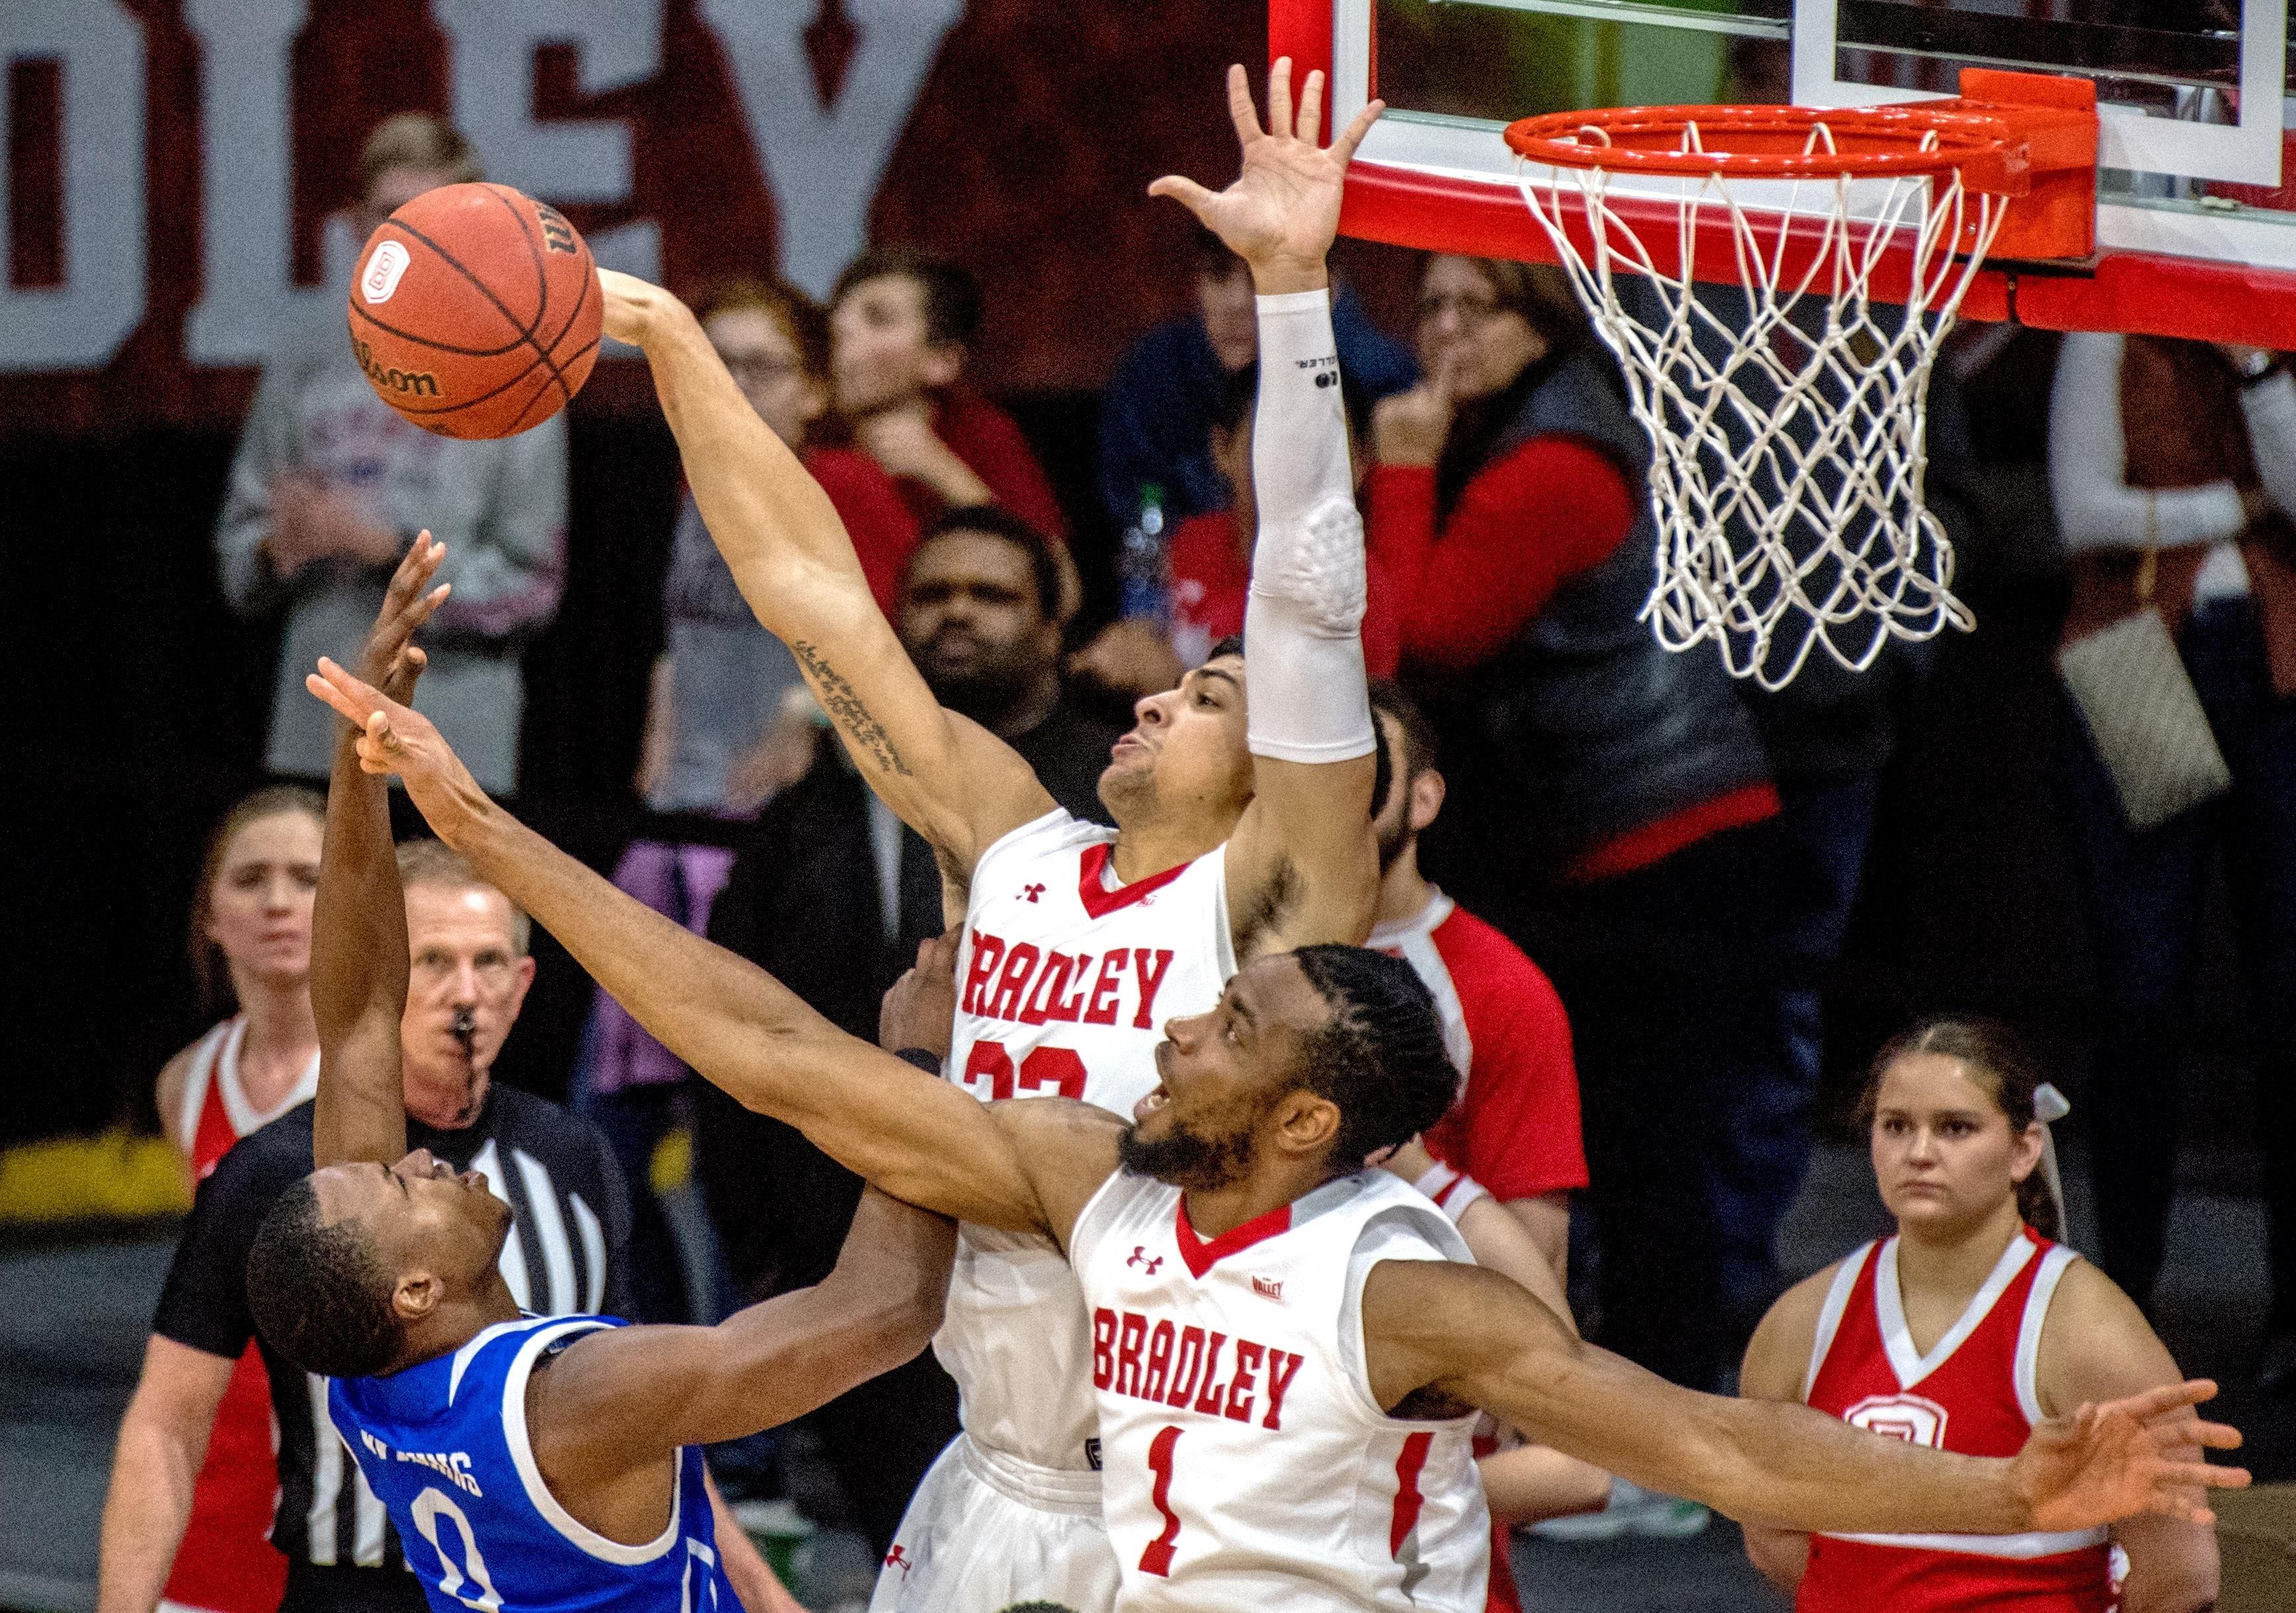 College basketball Bradley vs. Drake in 2020 College